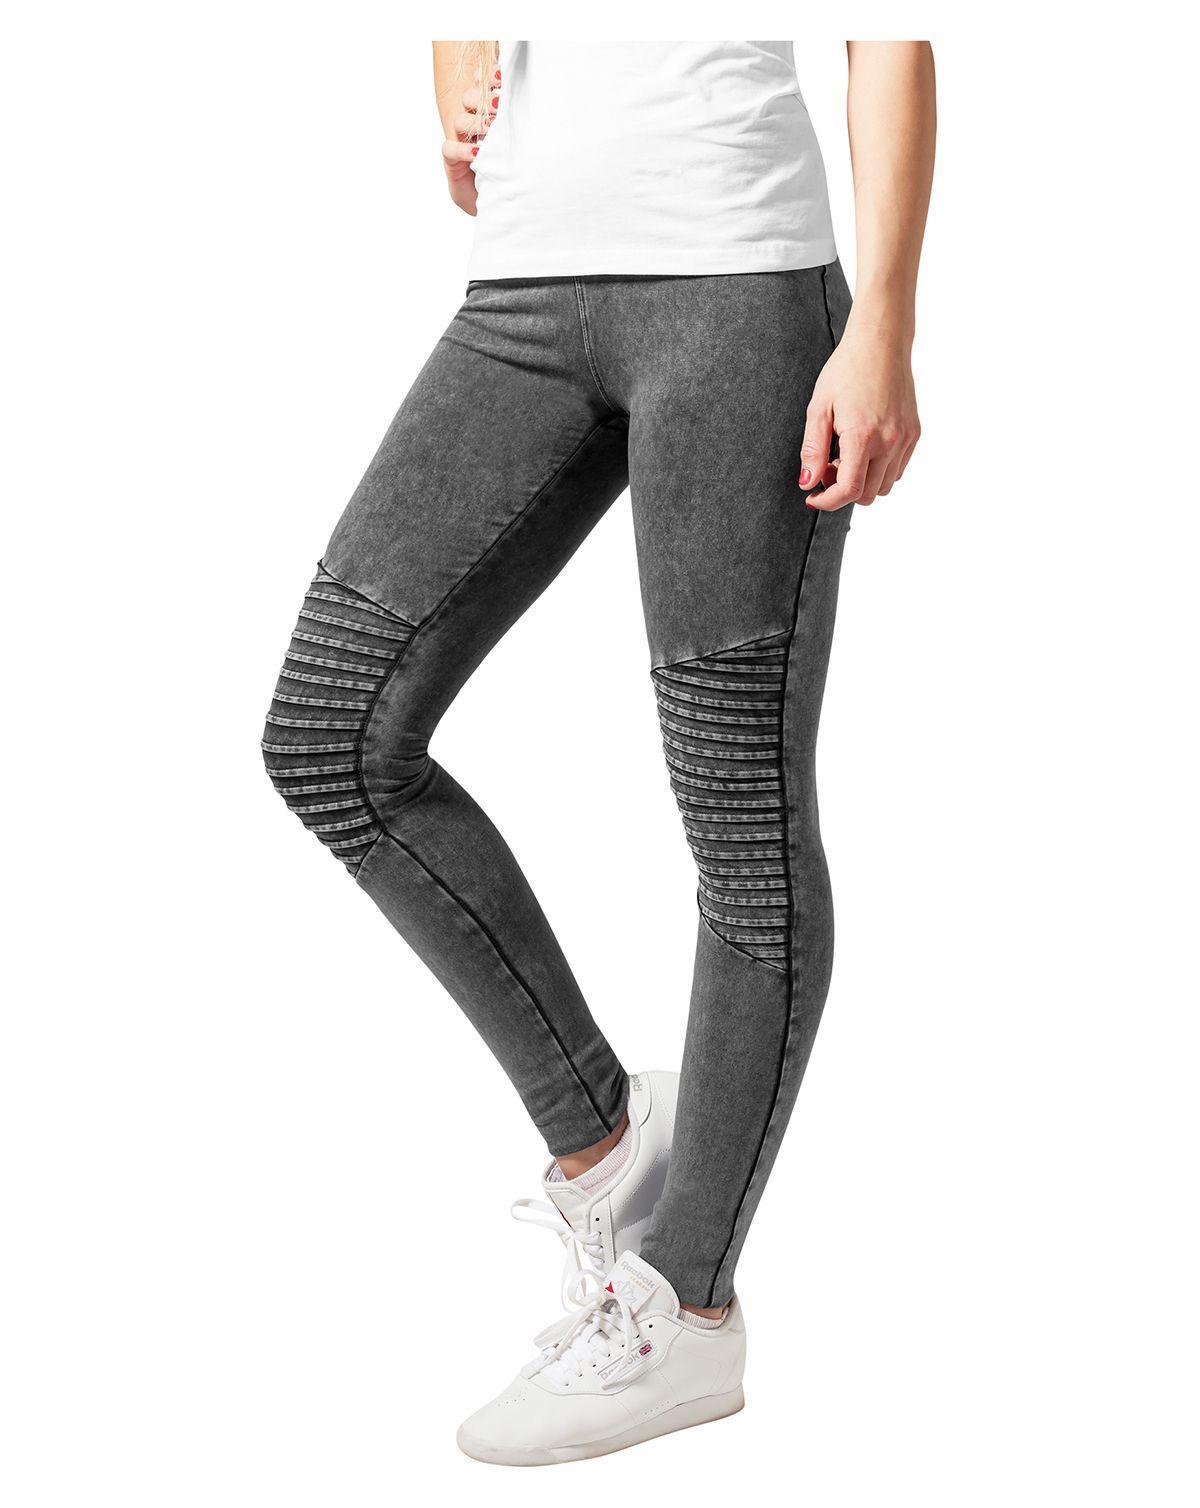 Urban Classics Denim Jersey Leggings (Dark Grey, XS)